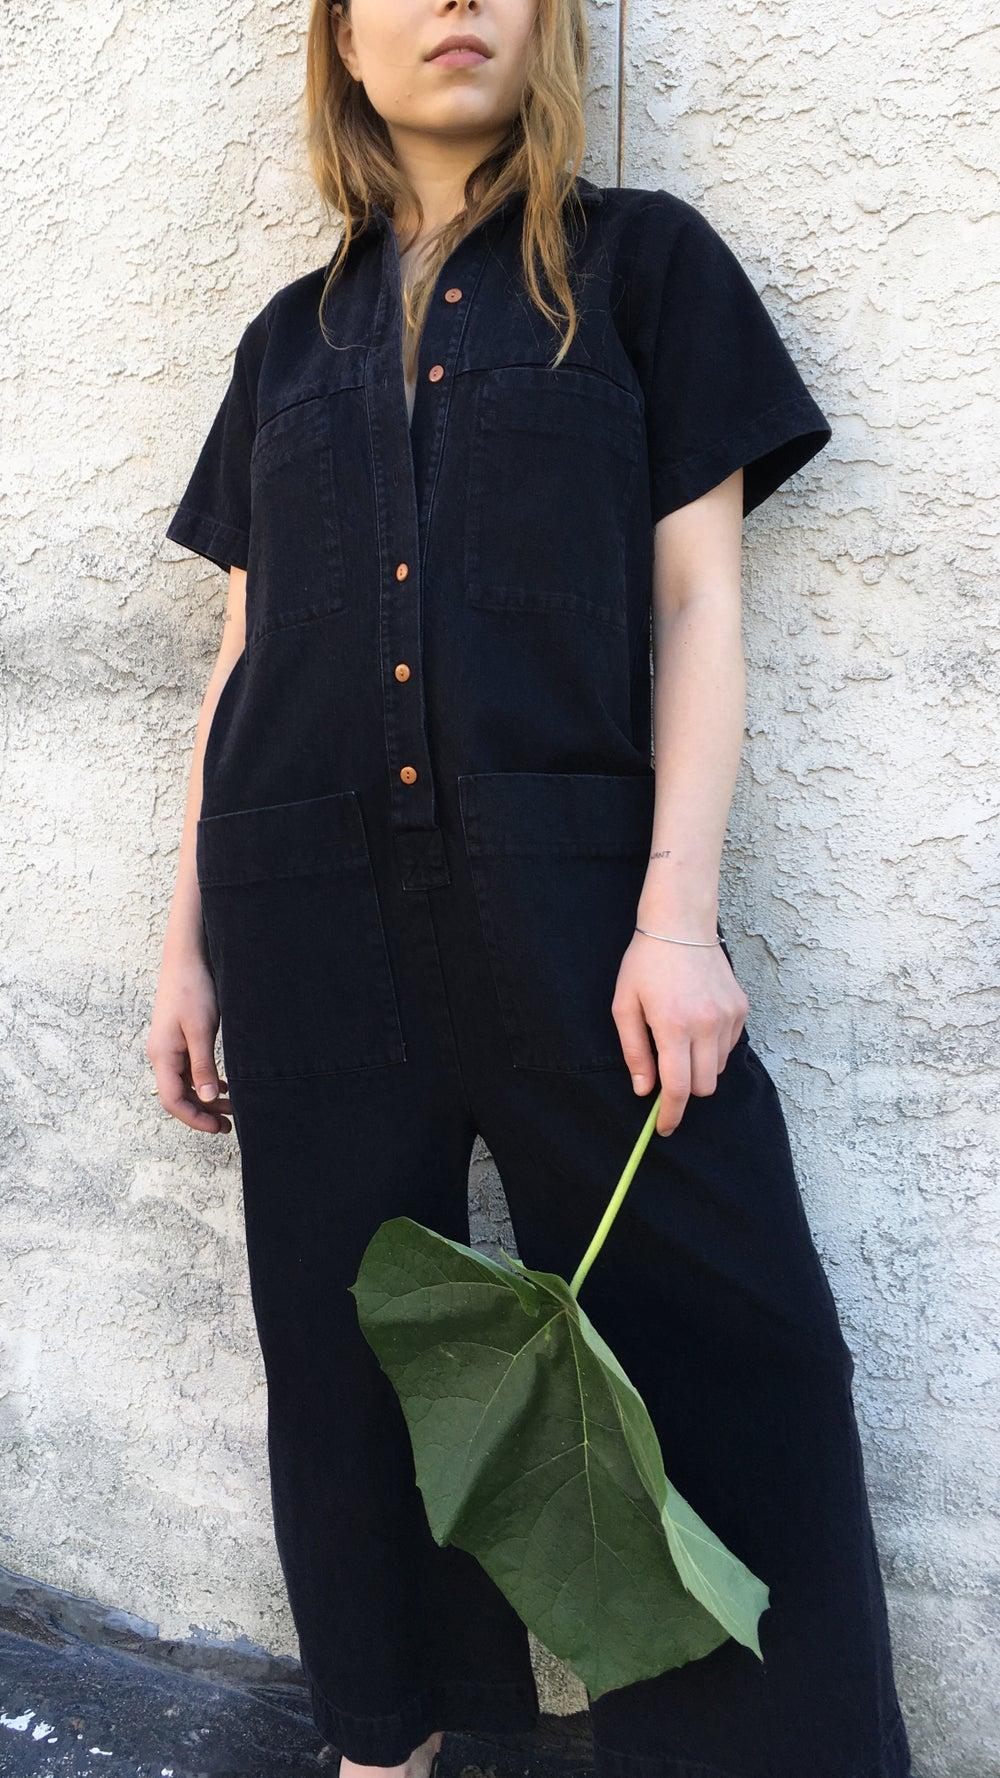 Image of Ilana Kohn Mabel Black Coverall